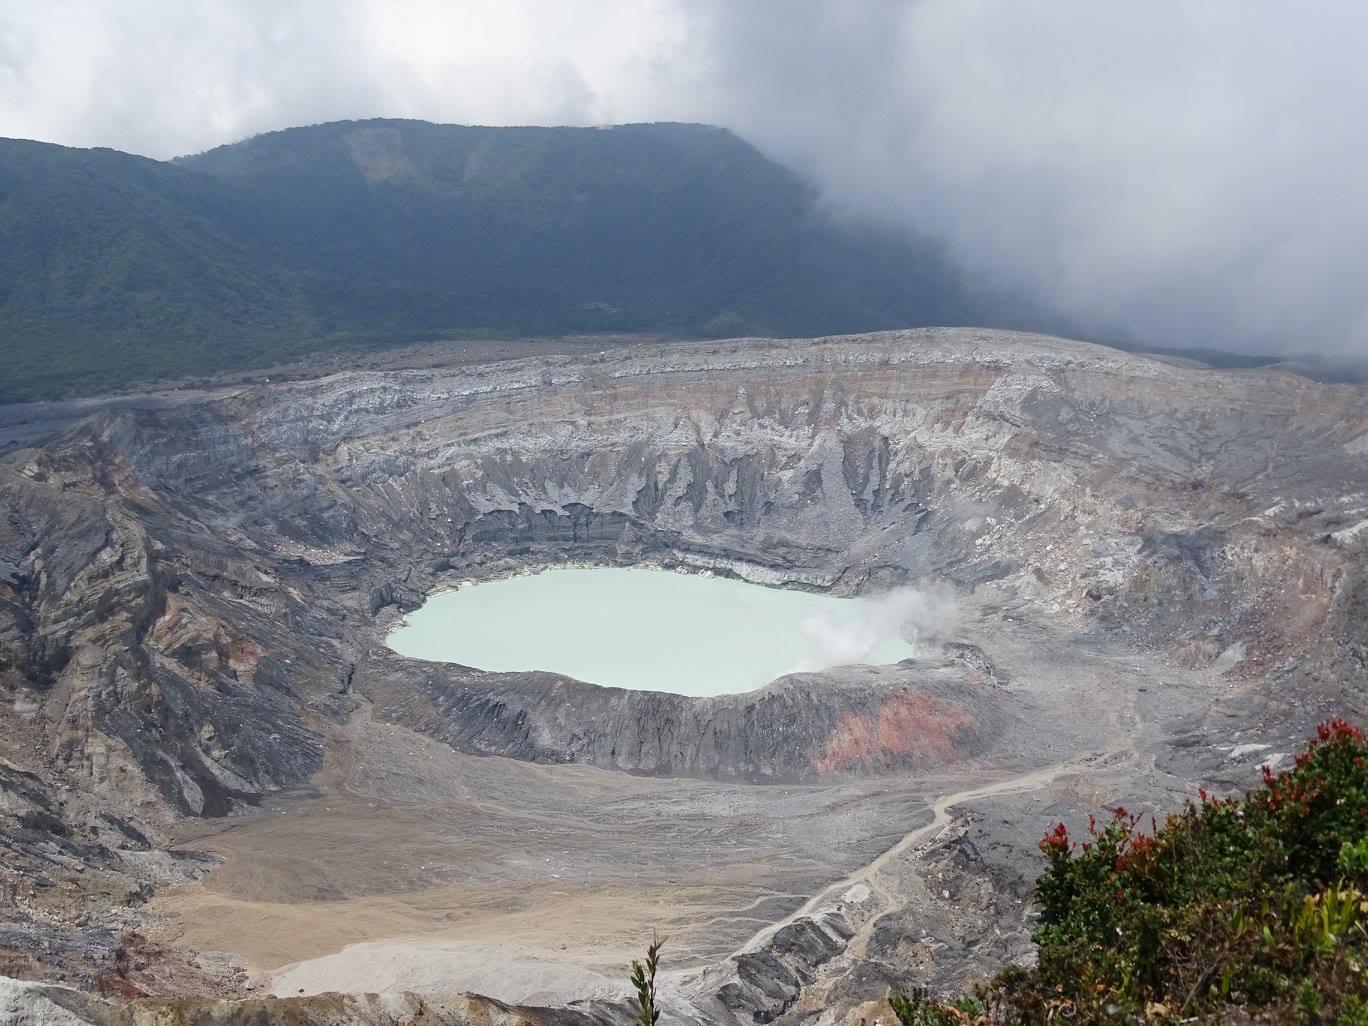 Volcans du Costa rica